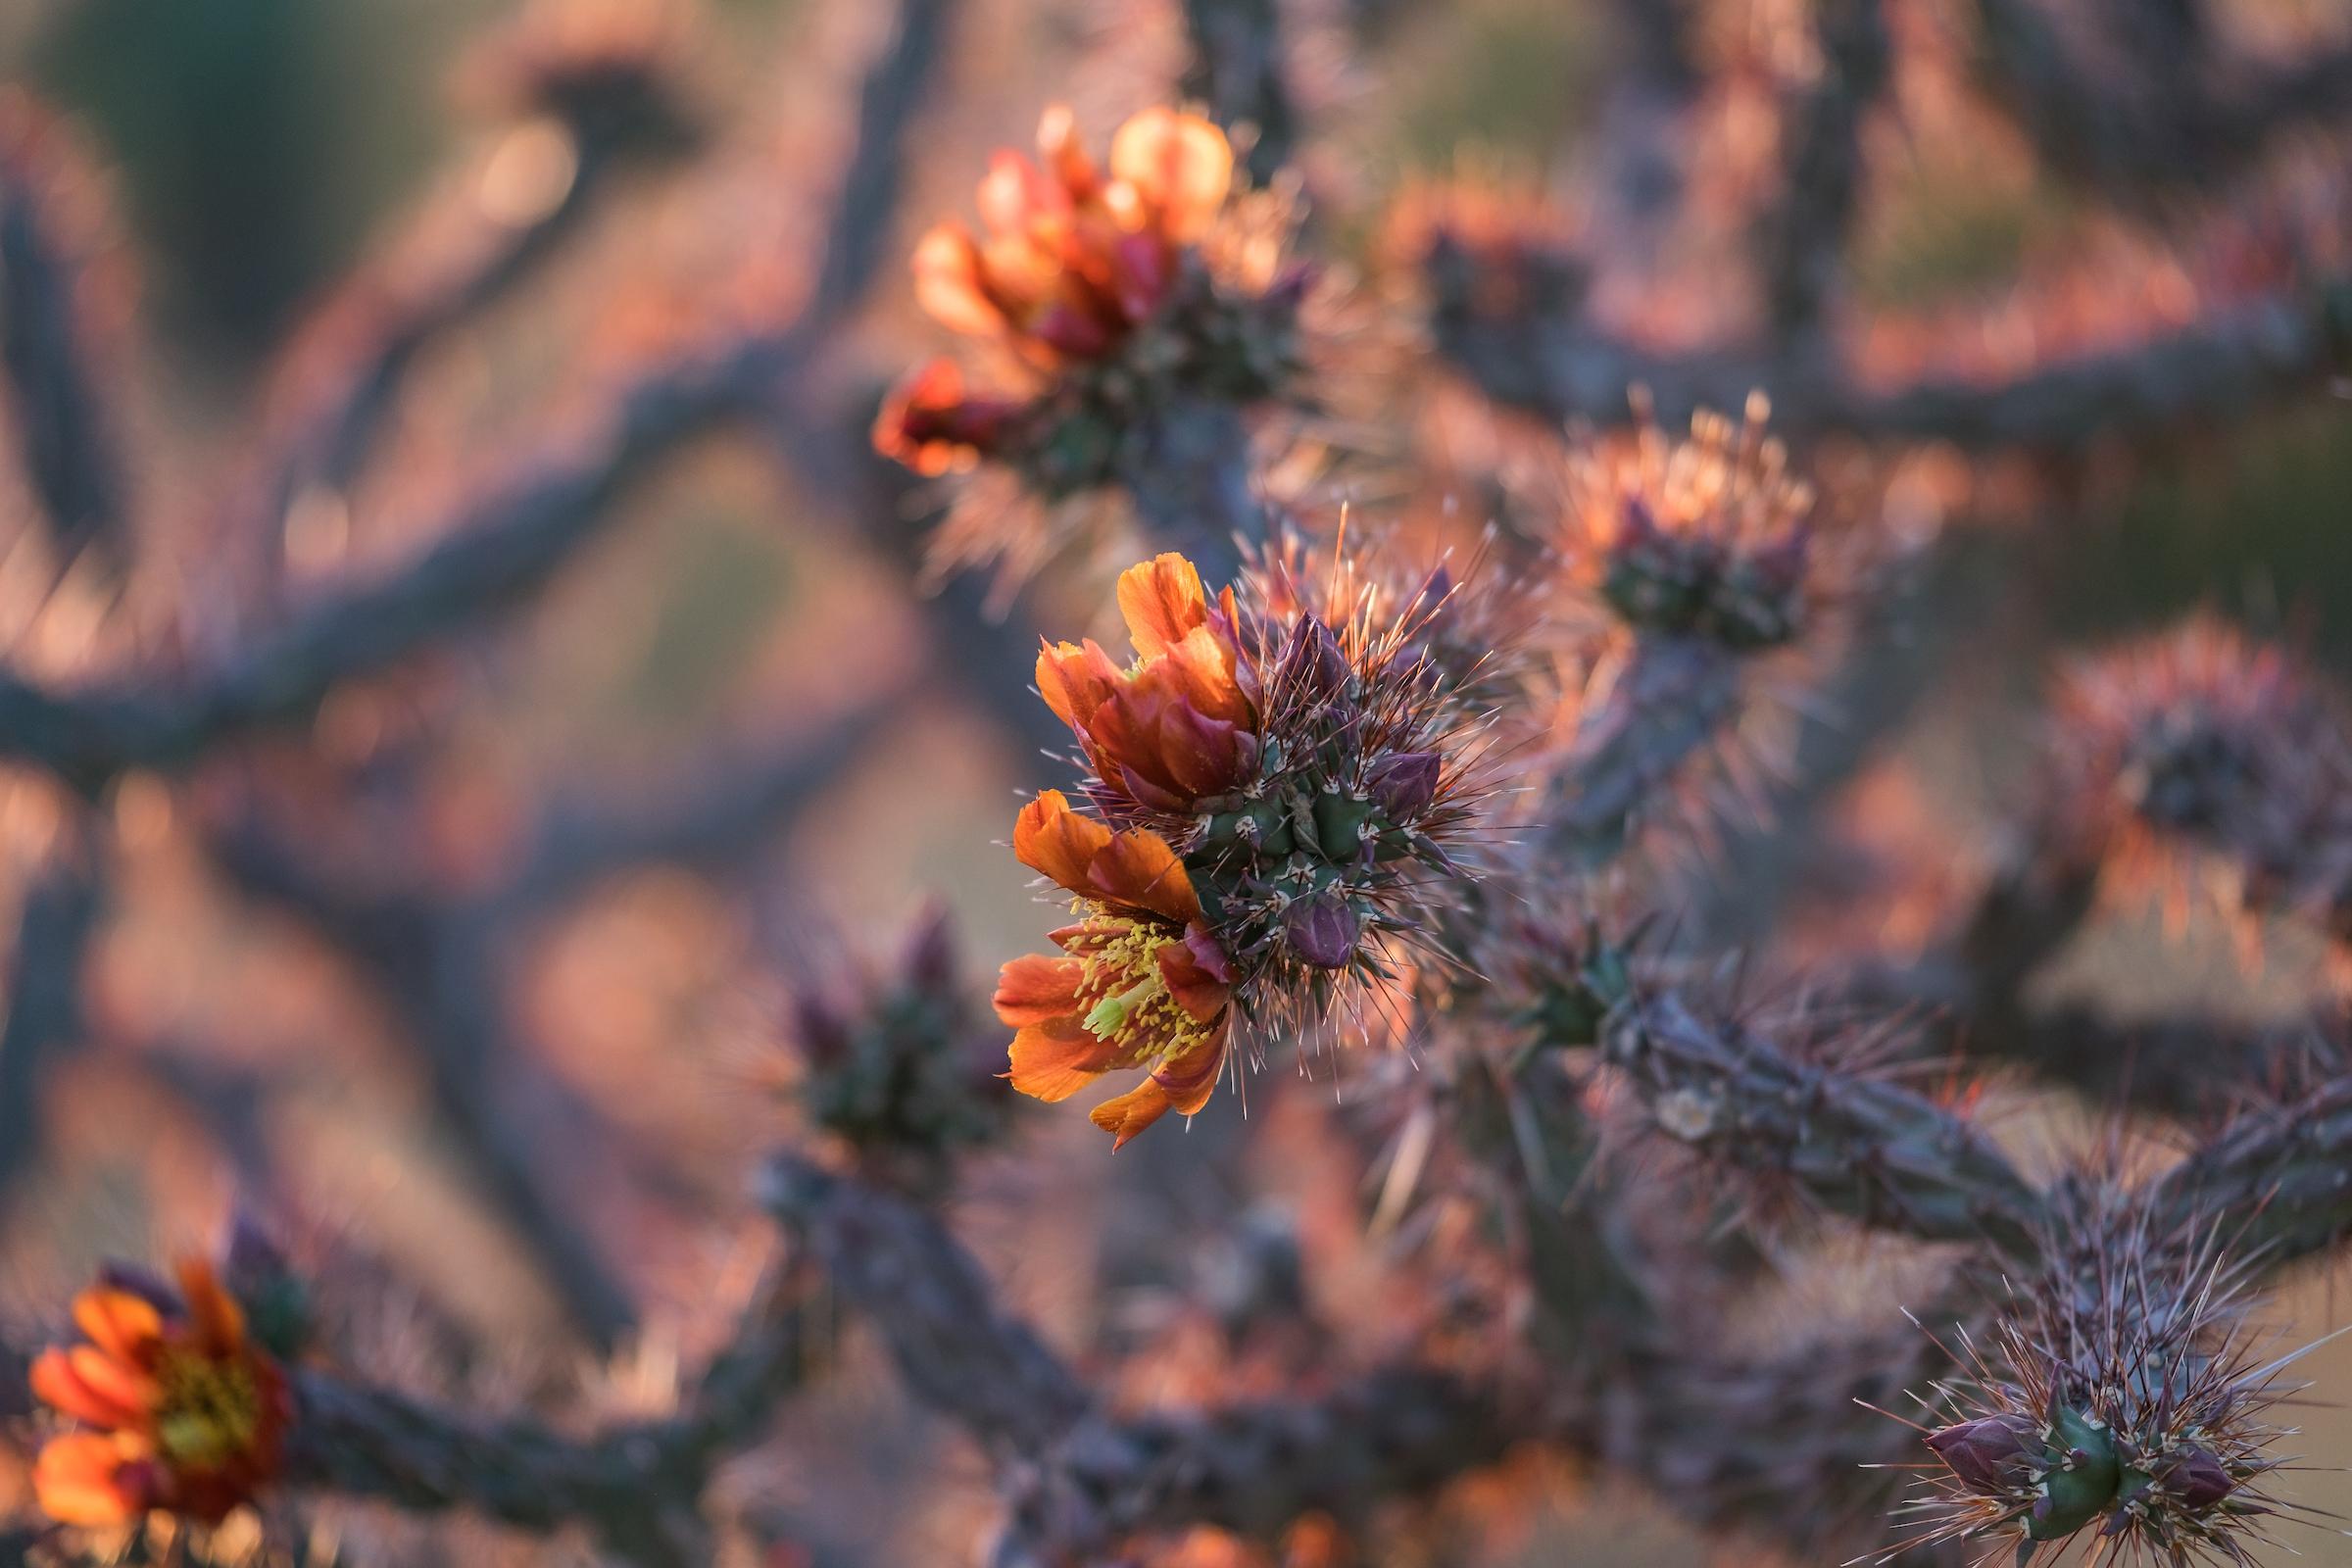 20160322-JI-Saguaro National Park-_DSF8552.jpg